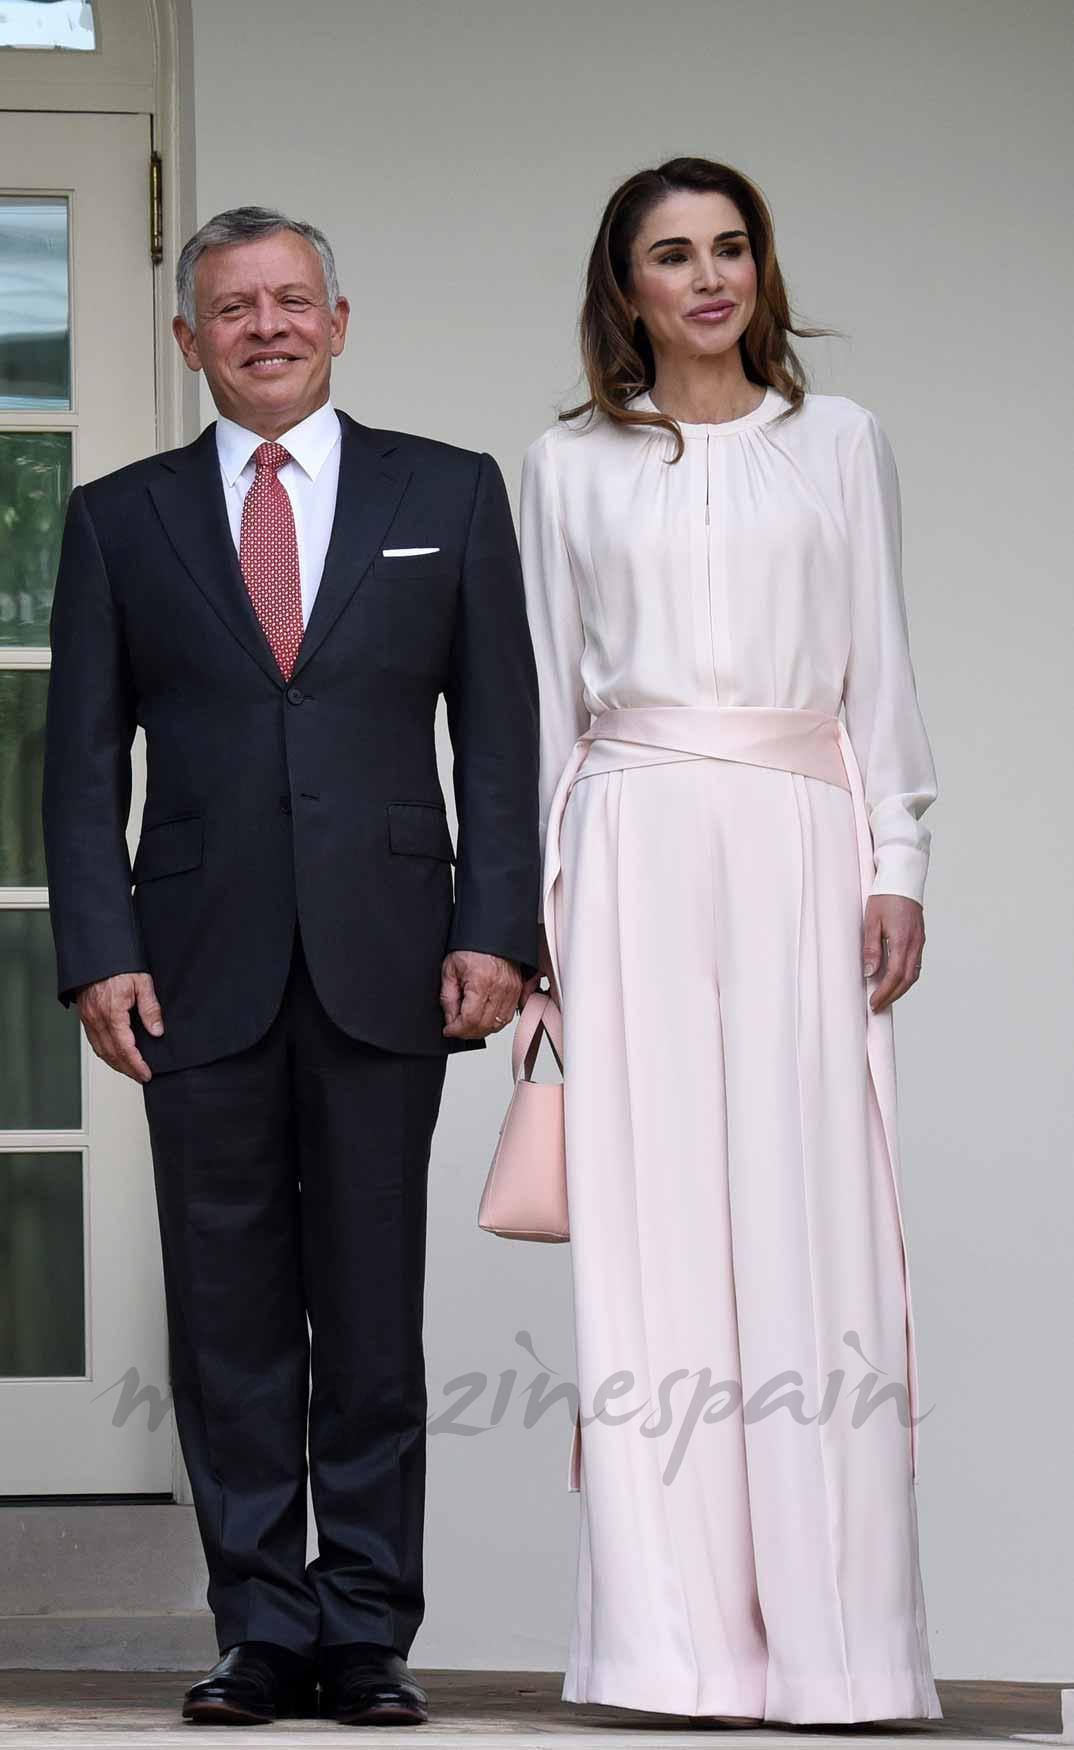 Rey Abdulá y reina Rania de Jordania